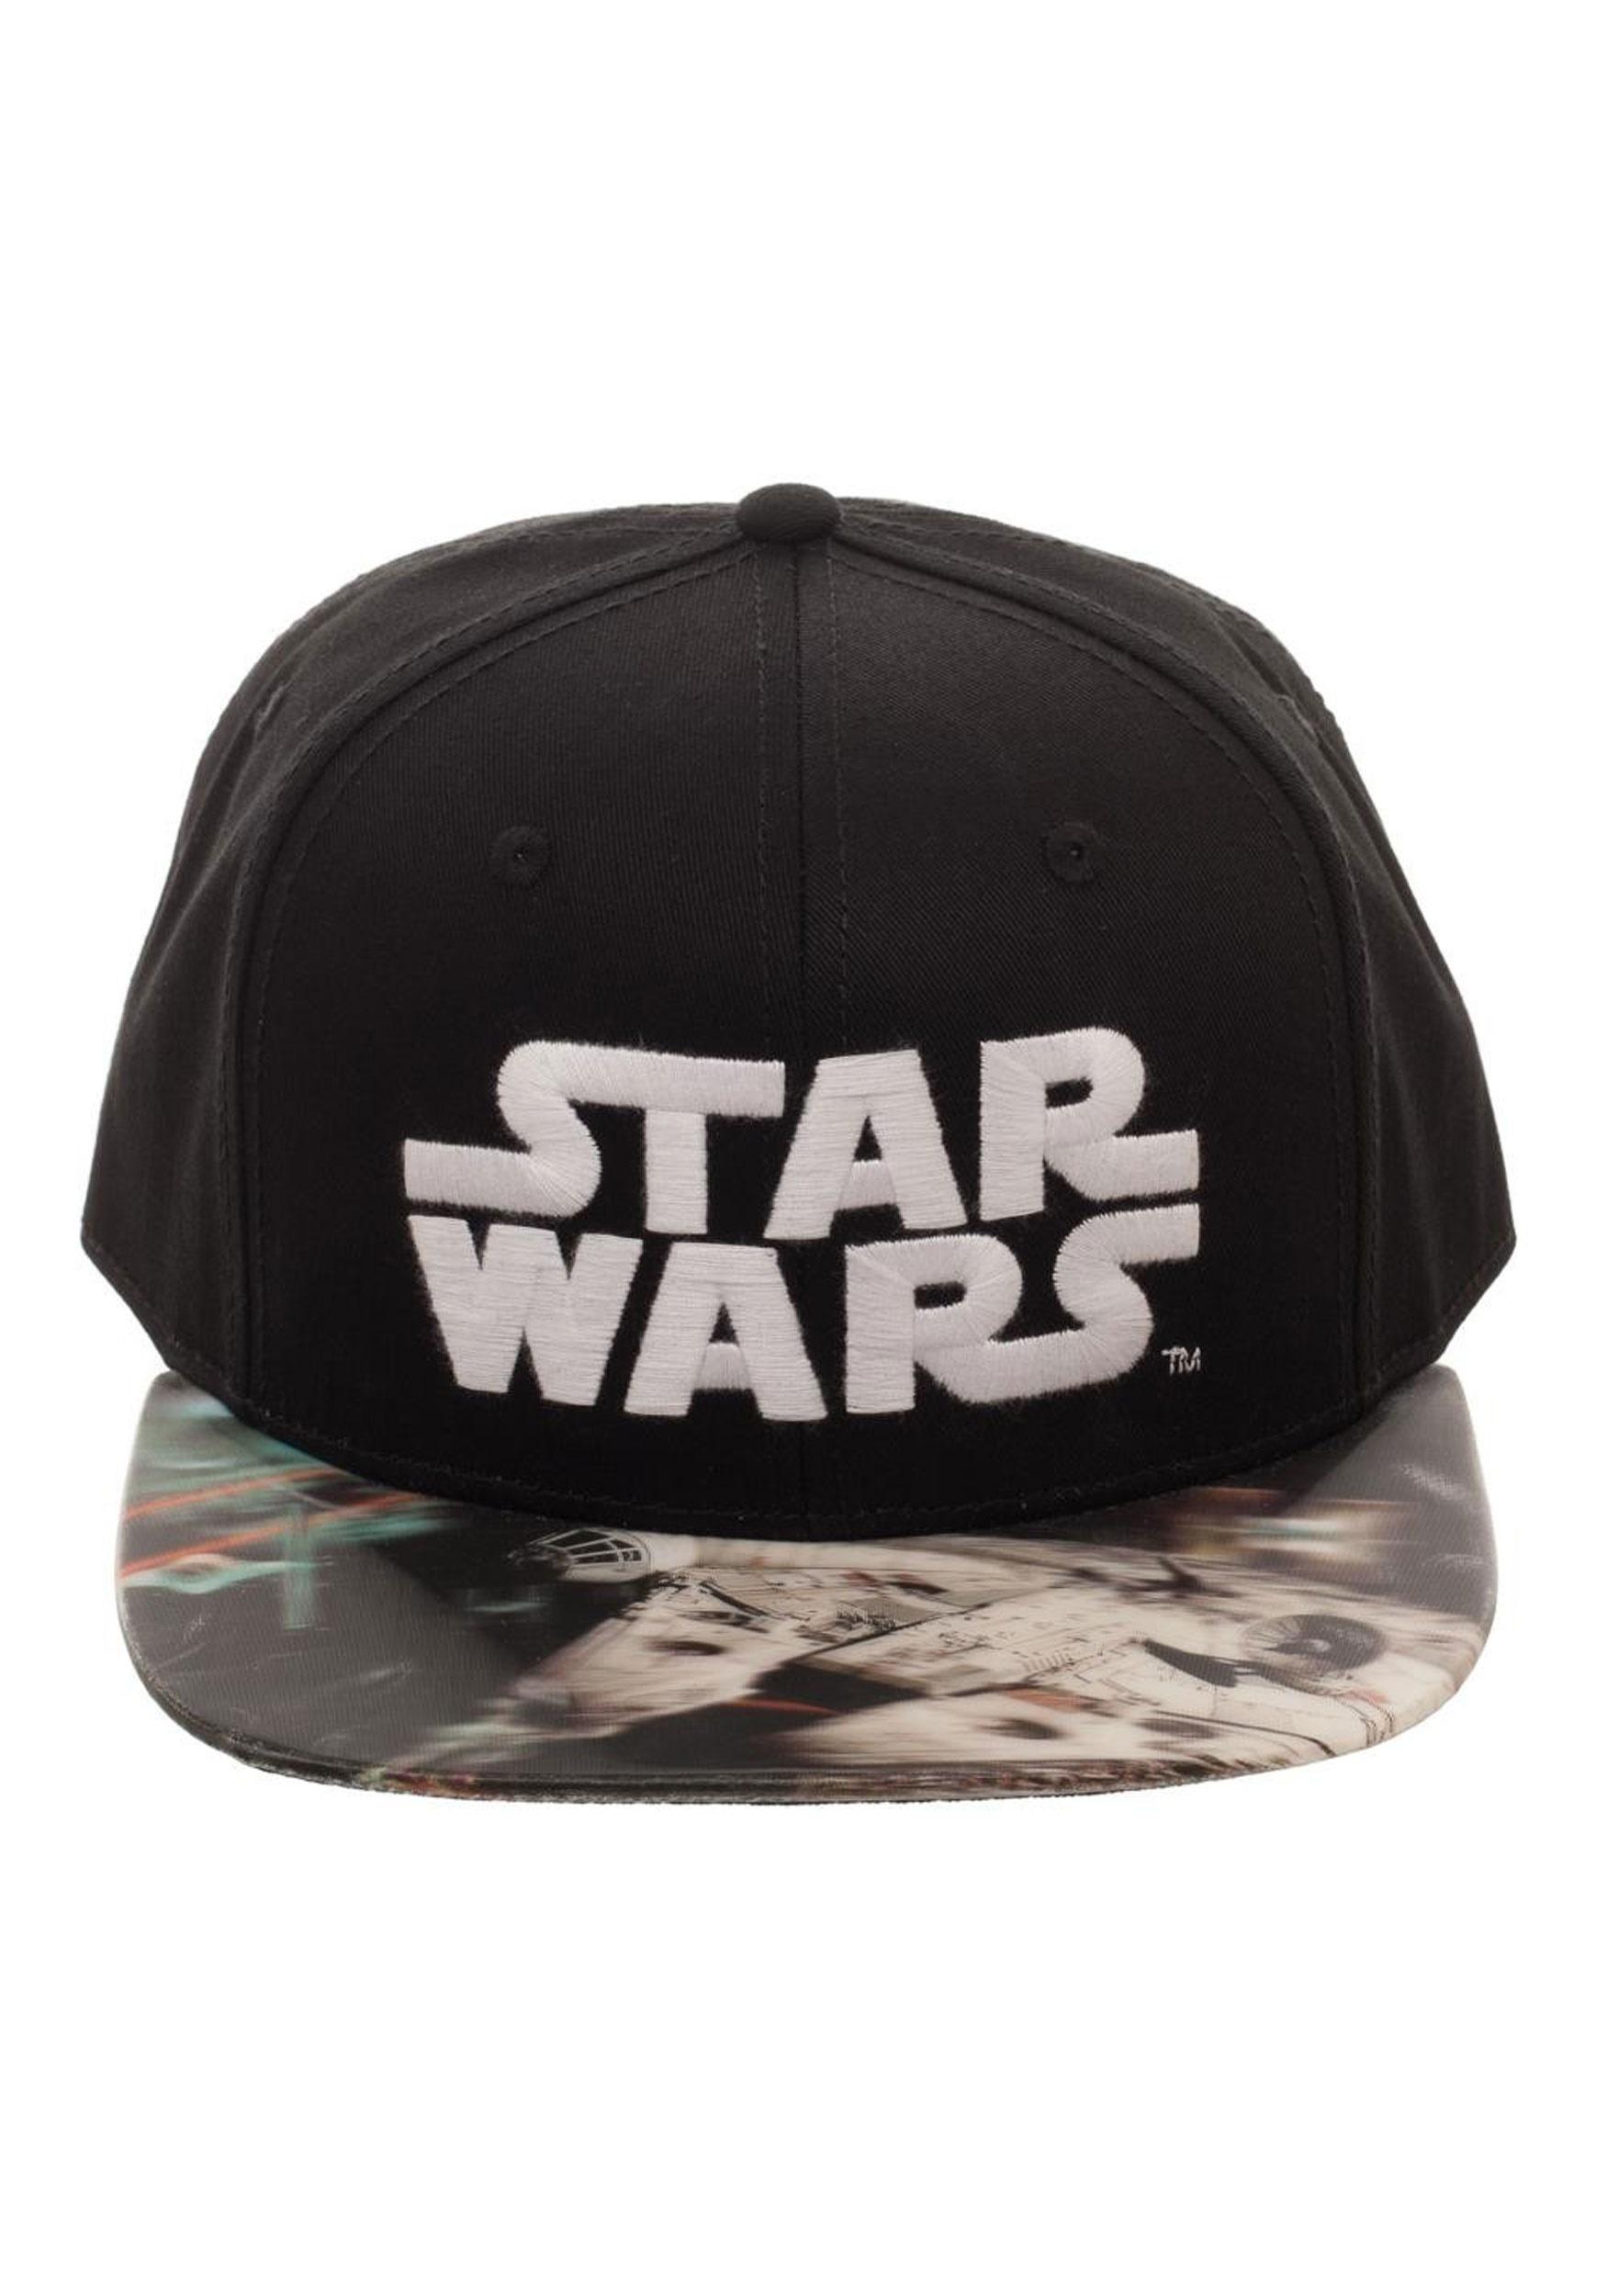 Millennium Falcon Star Wars Lenticular Bill Snapback Hat 0a1820573d